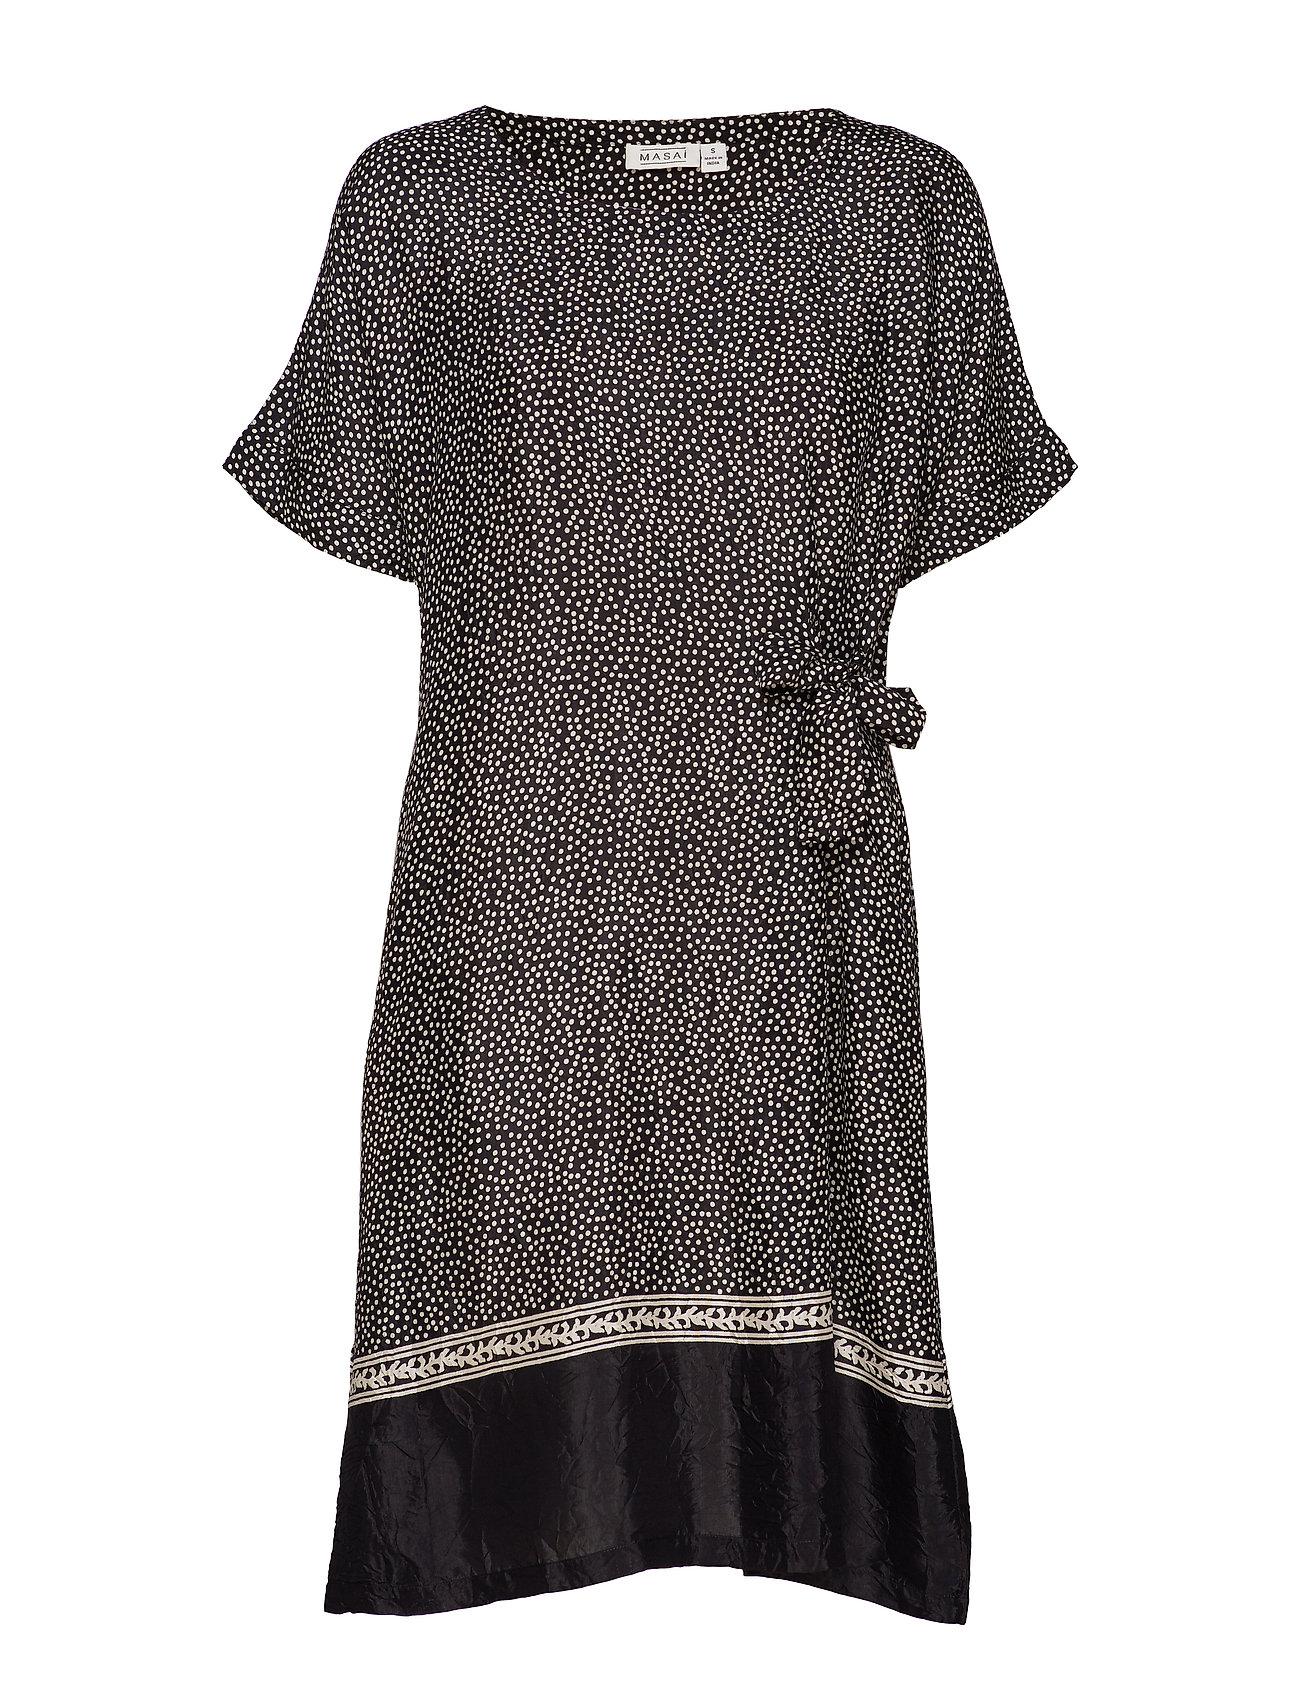 Masai Nata dress lenght 98 - BLACK ORG